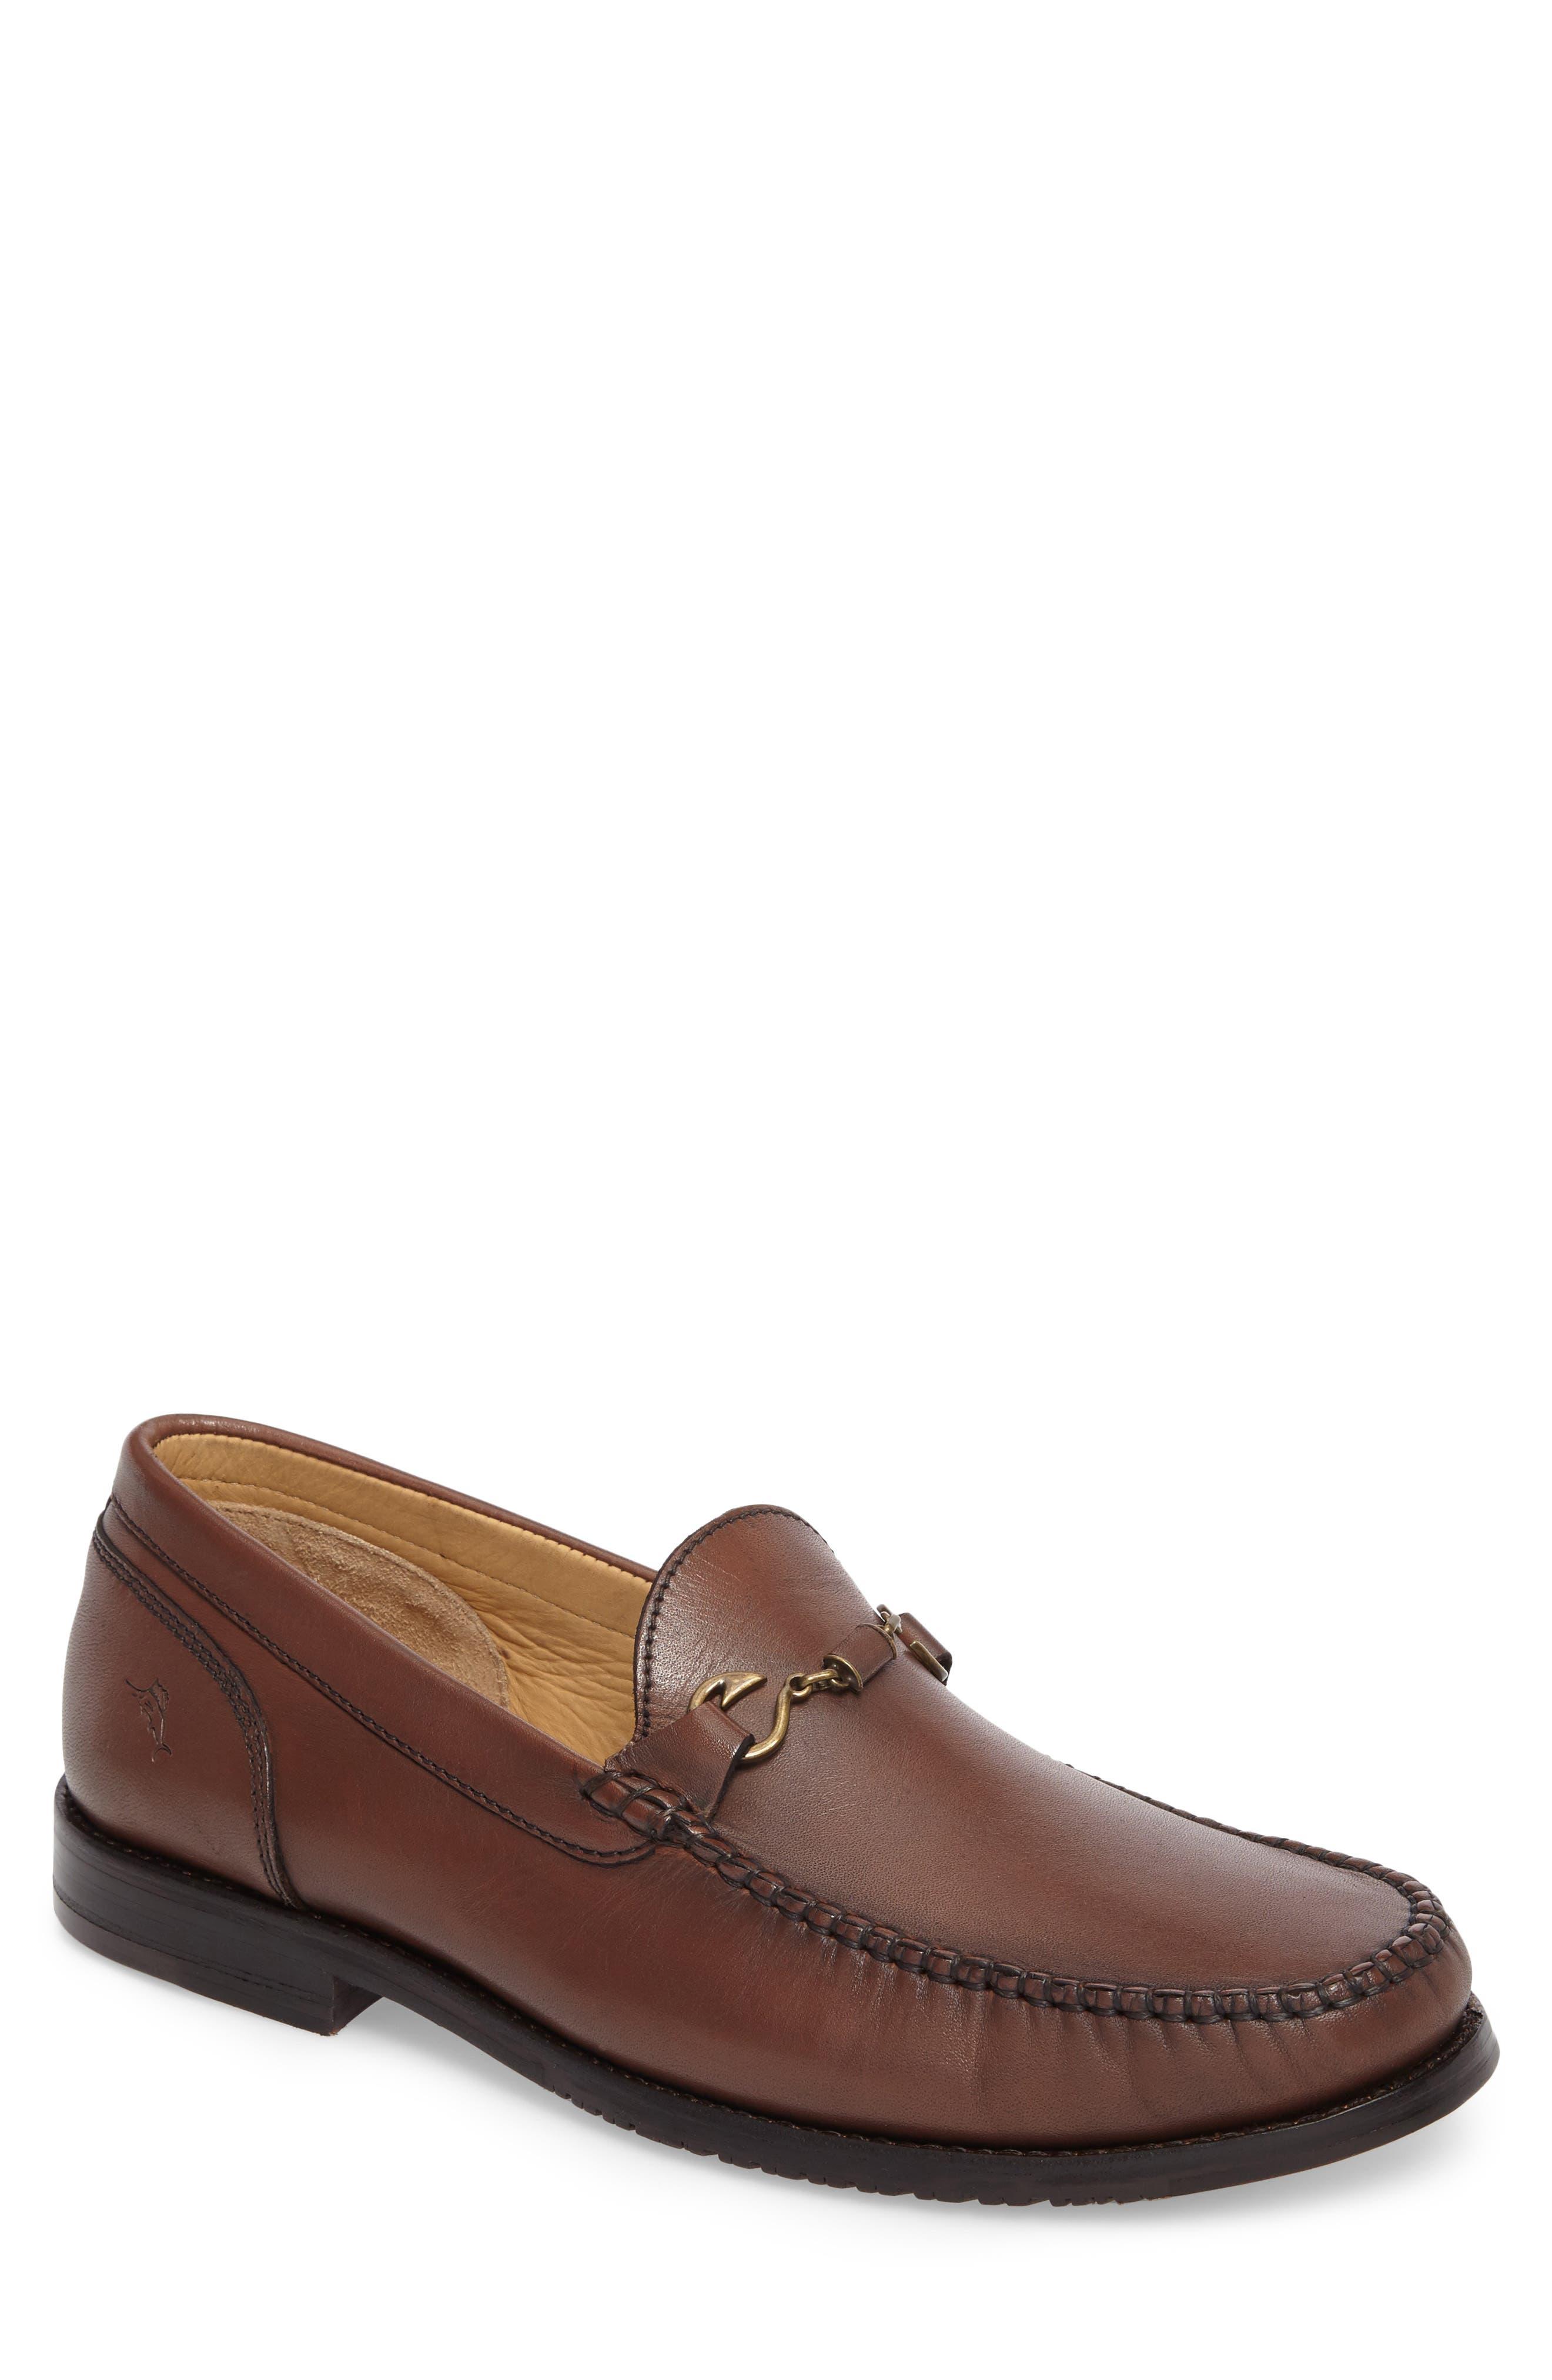 Maya Bay Bit Loafer,                             Main thumbnail 1, color,                             Brown Leather